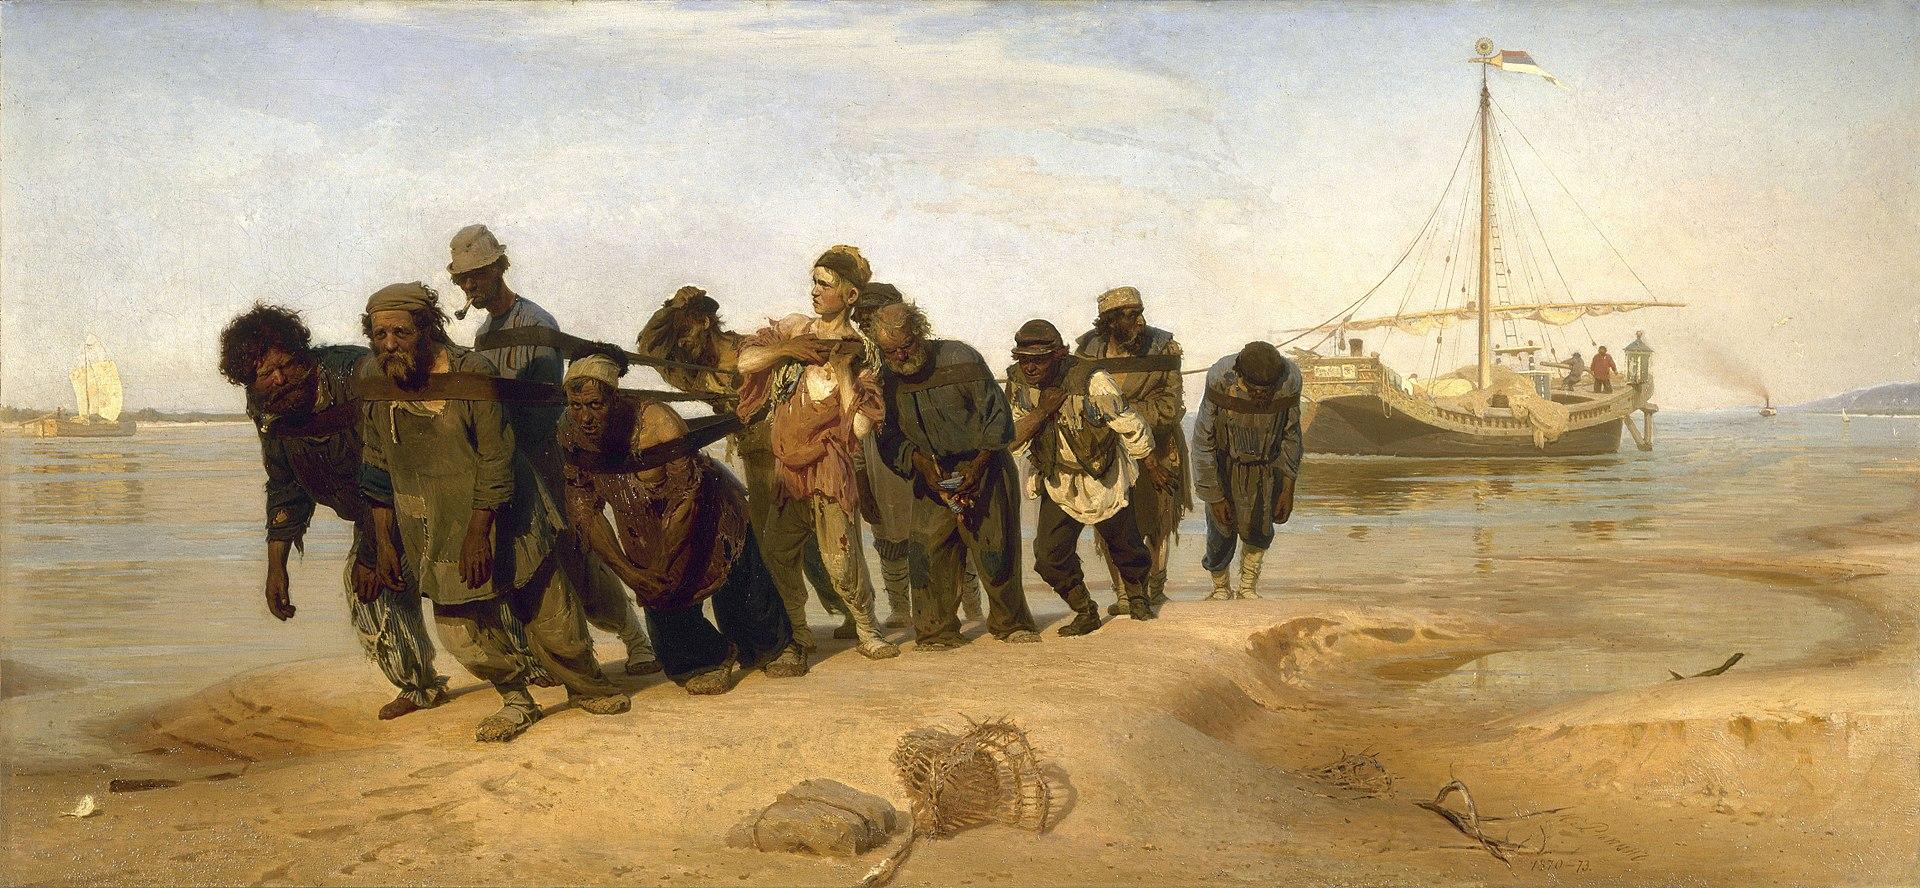 Ilya Repin - De Wolgaslepers, versie 2 (1873)